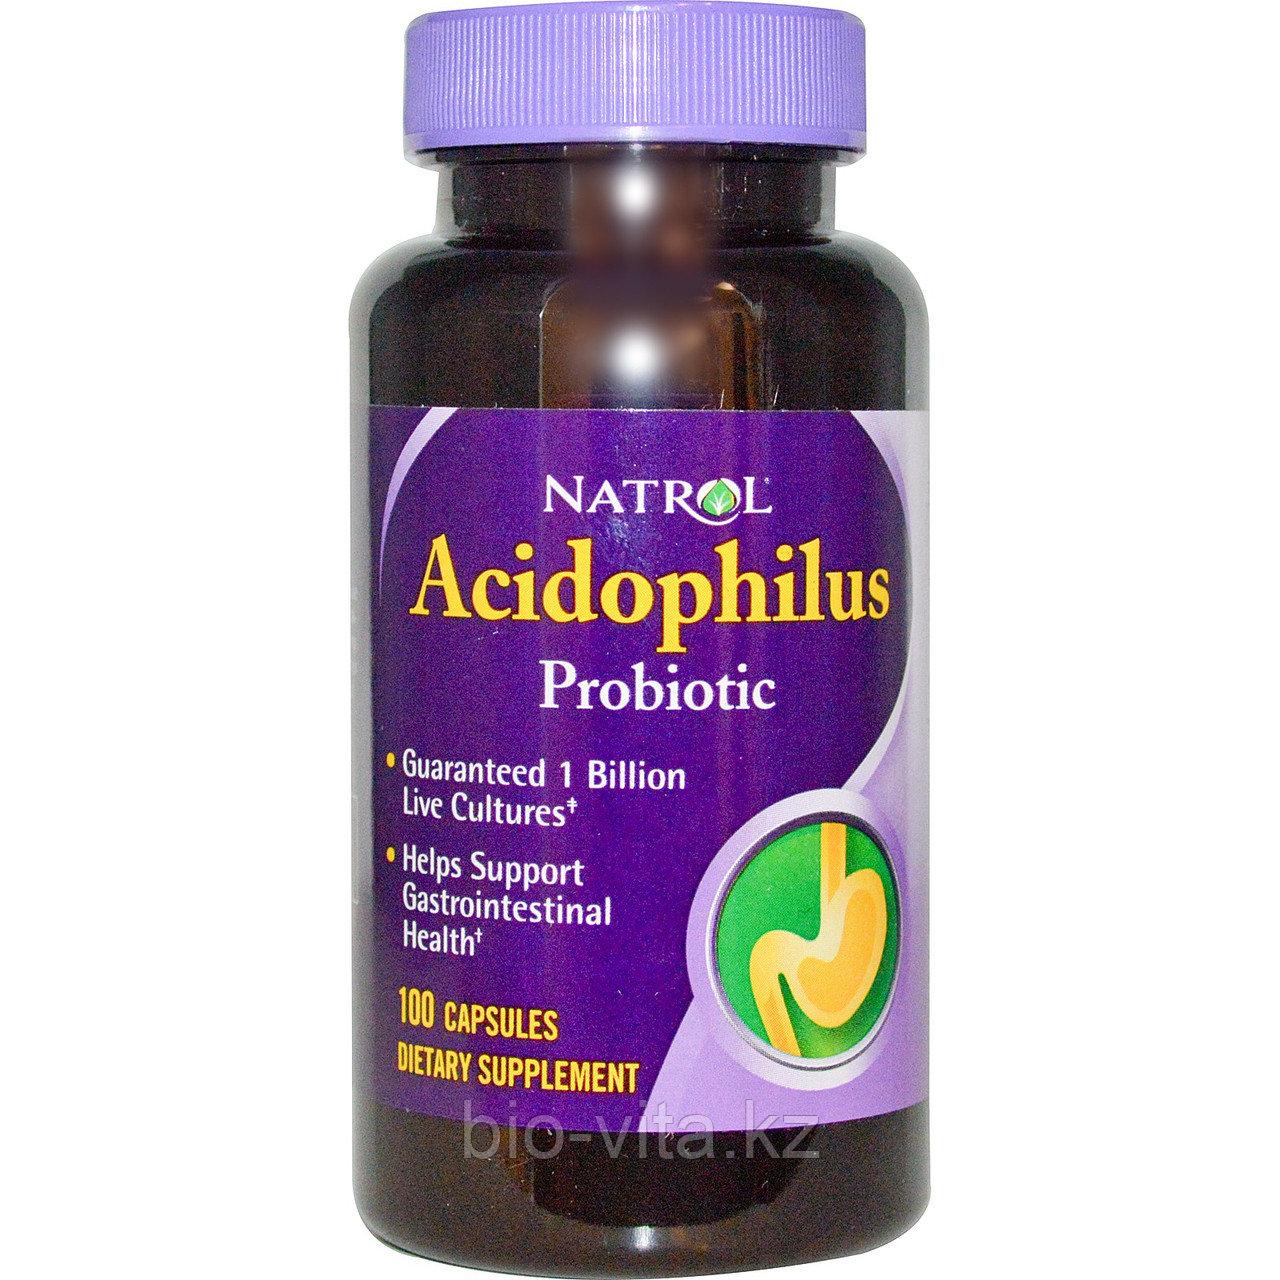 Пробиотик ацидофилус 1 млрд. ацидофильных бактерий, 100 капсул.  Natrol